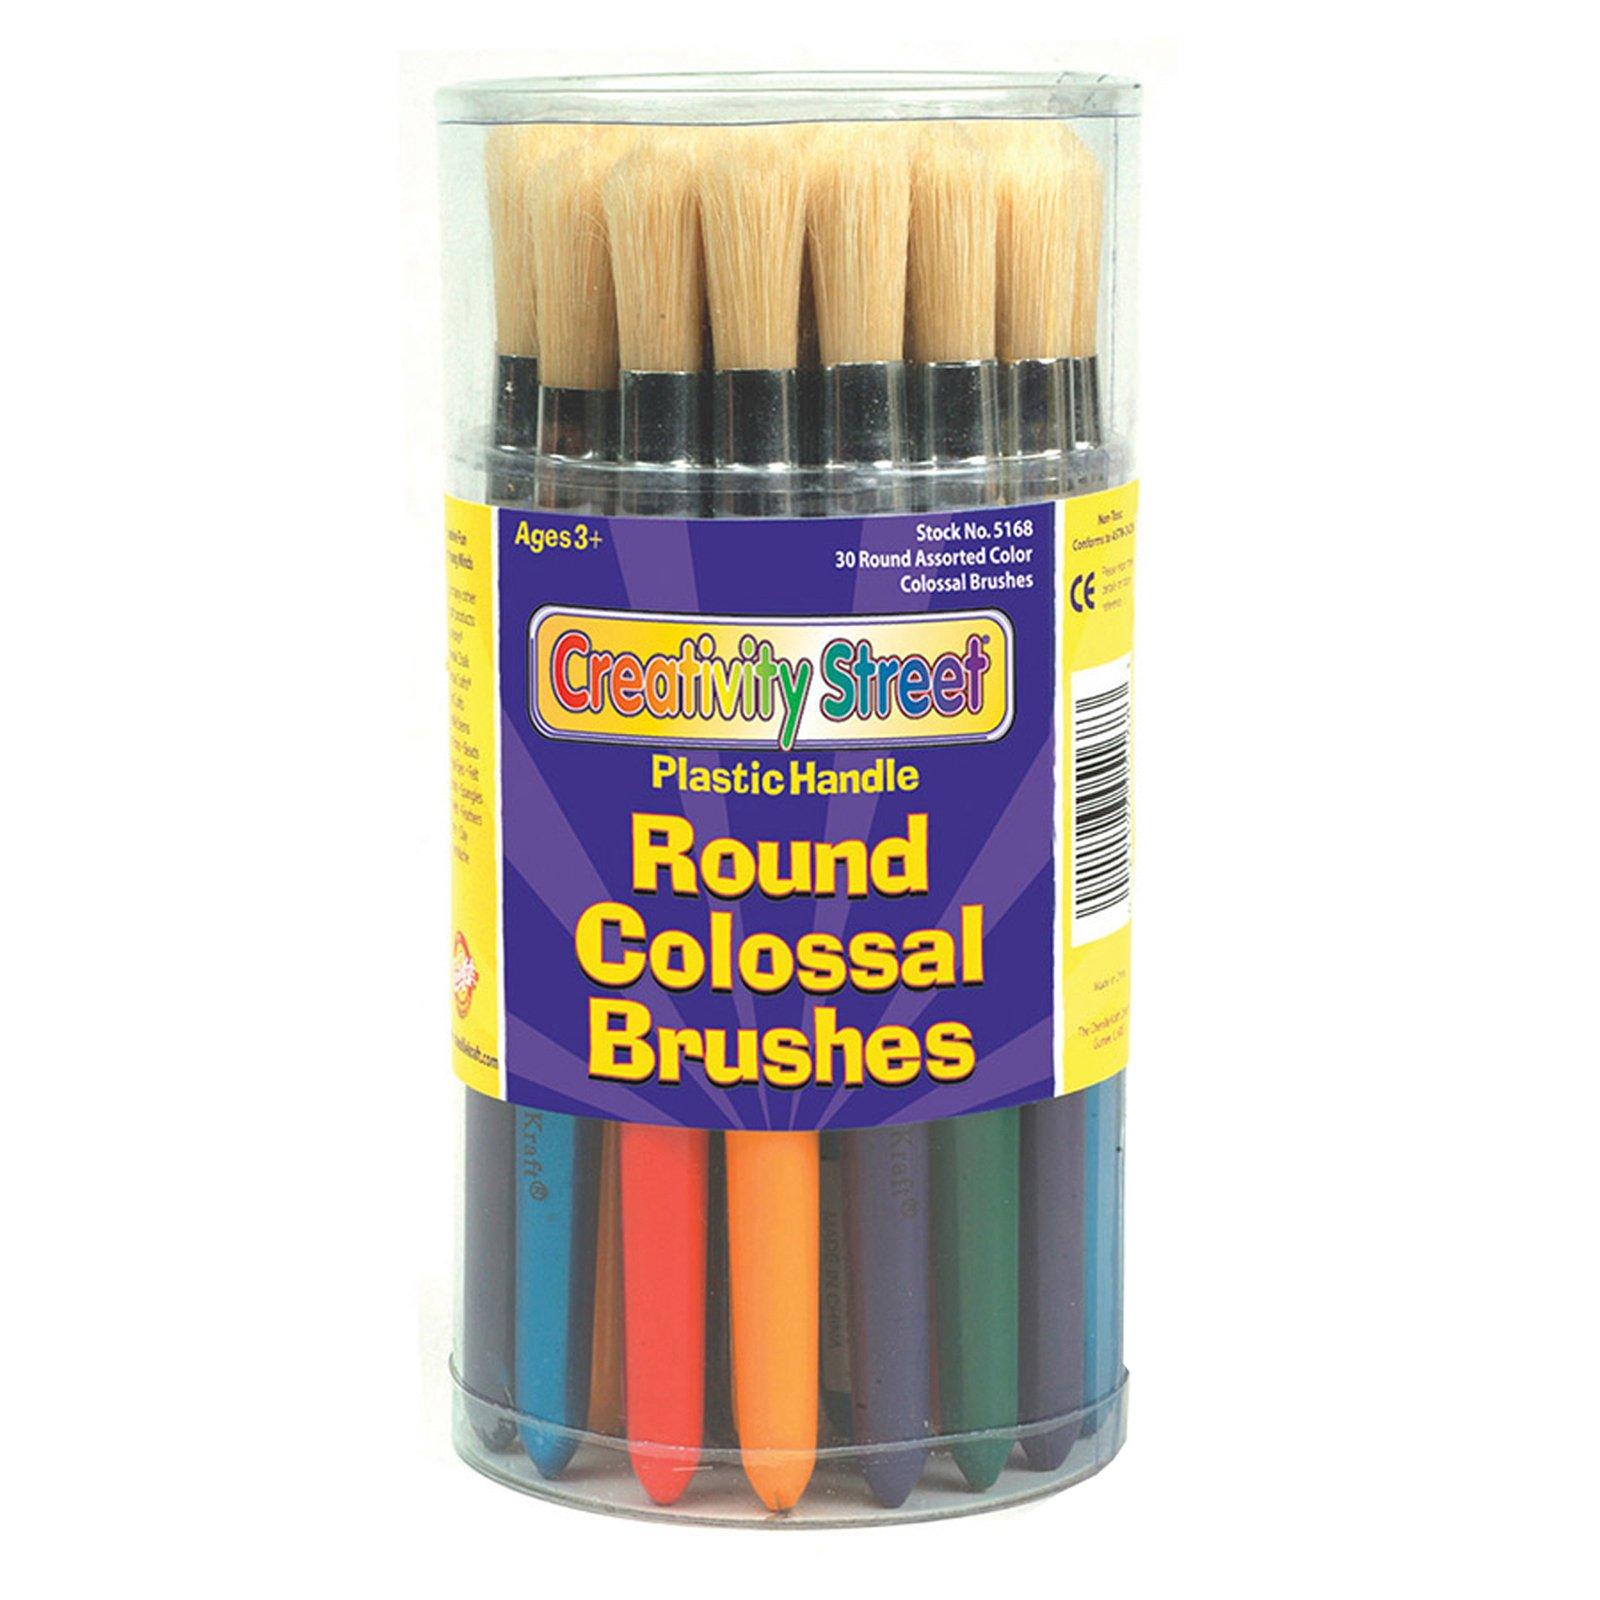 Creativity Street 5168 Colossal Brush, Natural Bristle, Round (Set of 30)